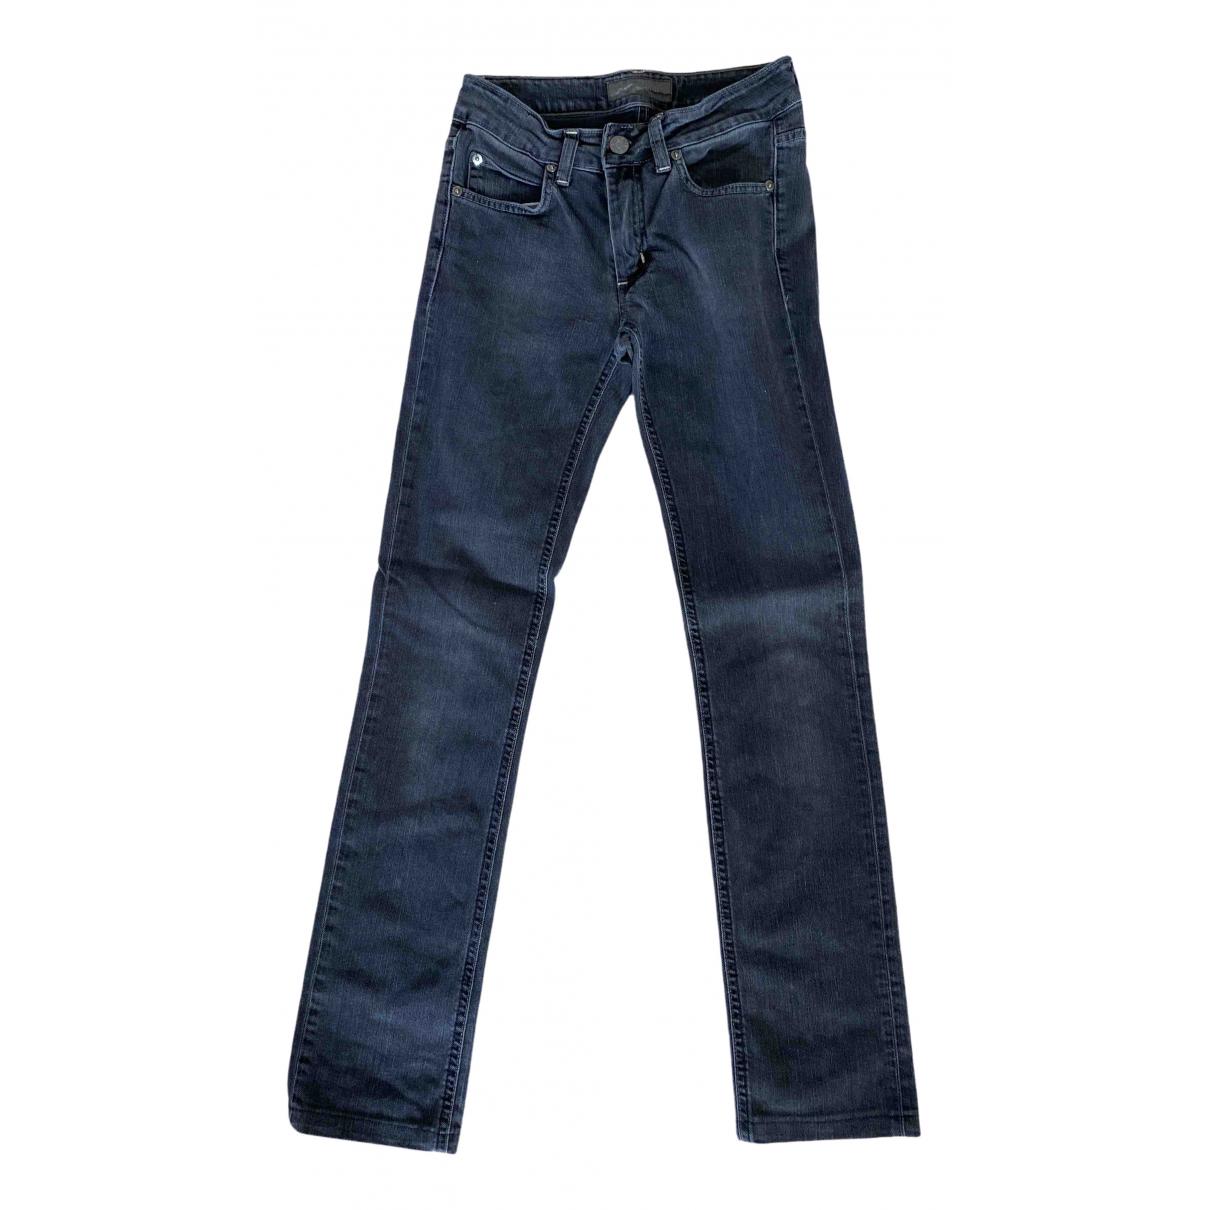 Acne Studios Hex Black Cotton - elasthane Jeans for Women 25 US